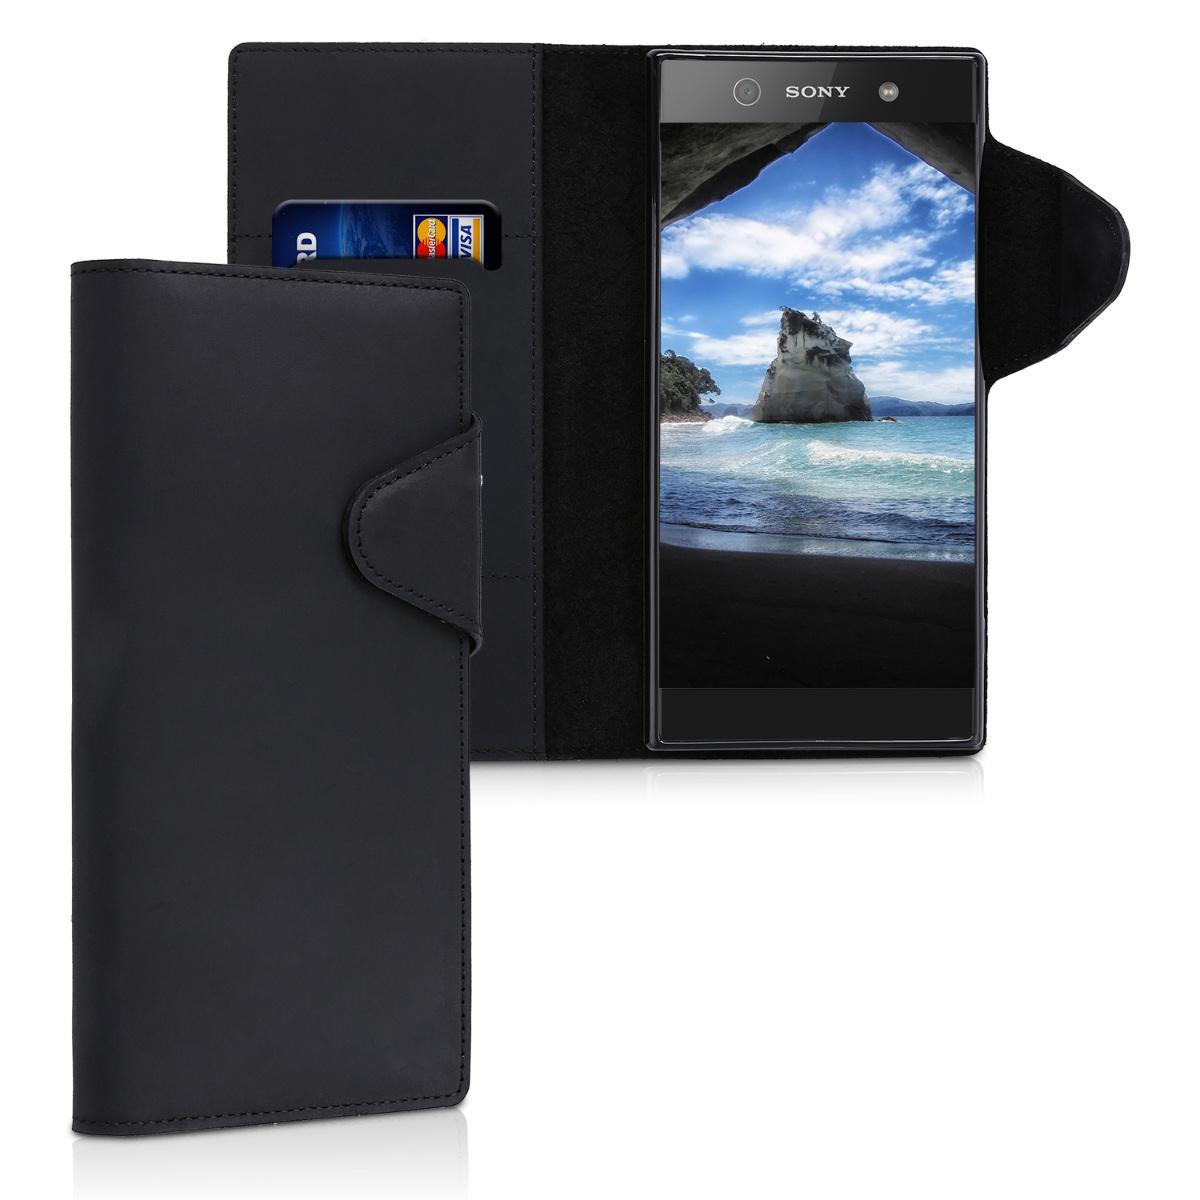 Kalibri Δερμάτινη Suede Θήκη - Πορτοφόλι Sony Xperia XA1 Ultra - Black (43450.01)